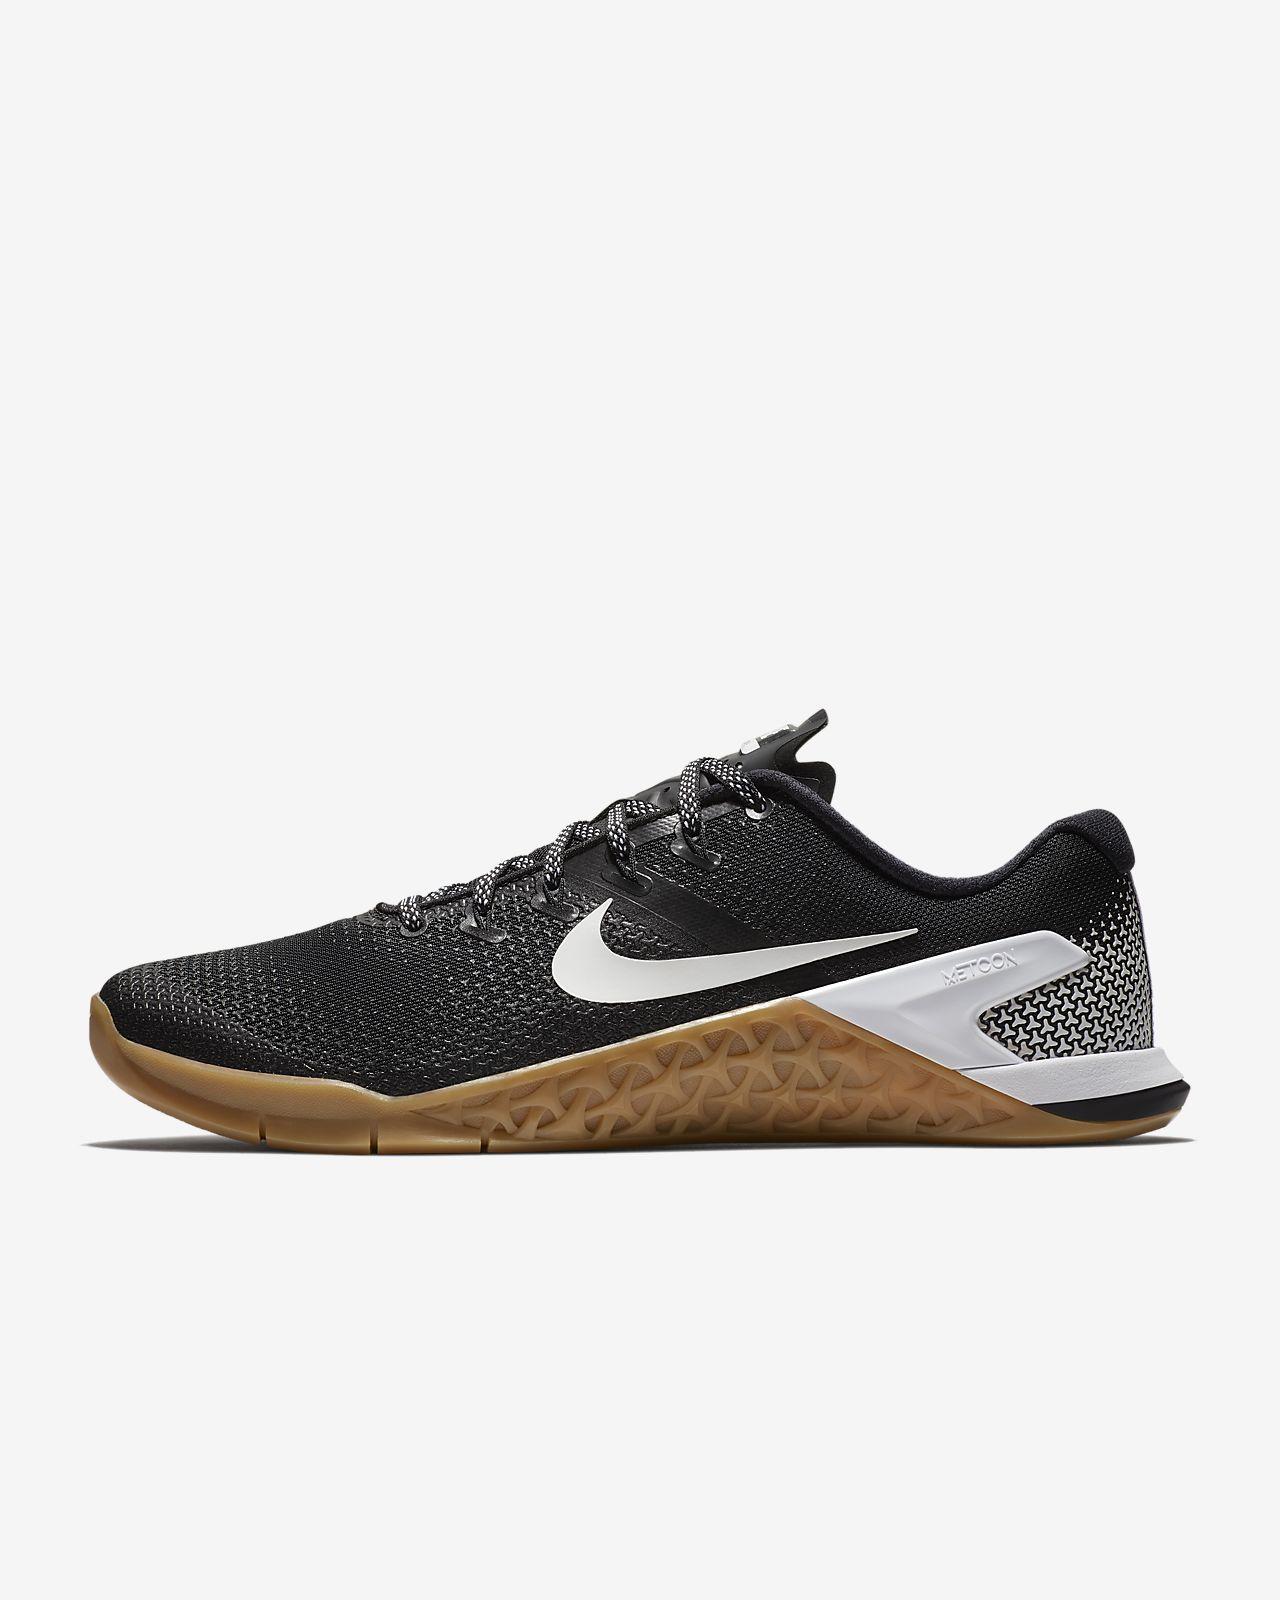 13e30a93ab6 ... Calzado de cross-training y levantamiento de pesas para hombre Nike  Metcon 4